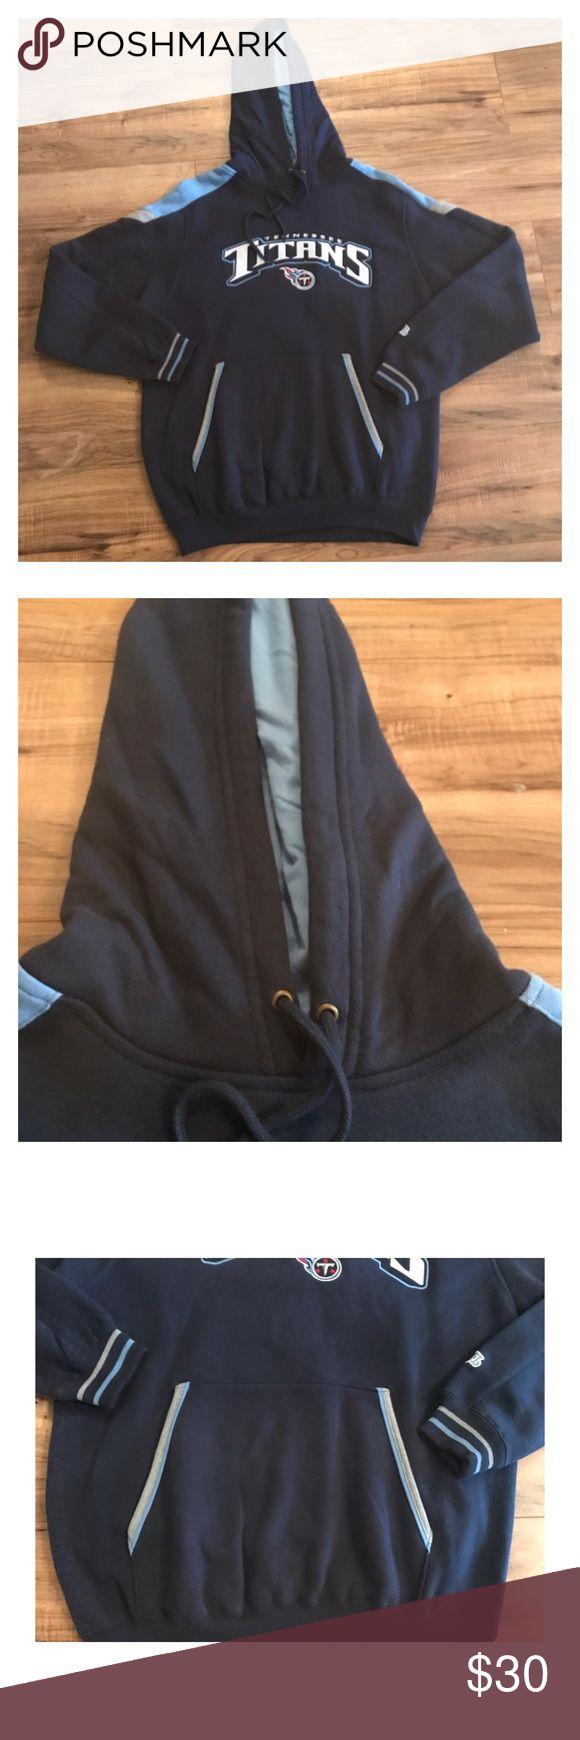 NFL Tennessee Titans sweatshirt M NFL men's Tennessee Titans pull over hoodie size medium. Like new. NFL Shirts Sweatshirts & Hoodies